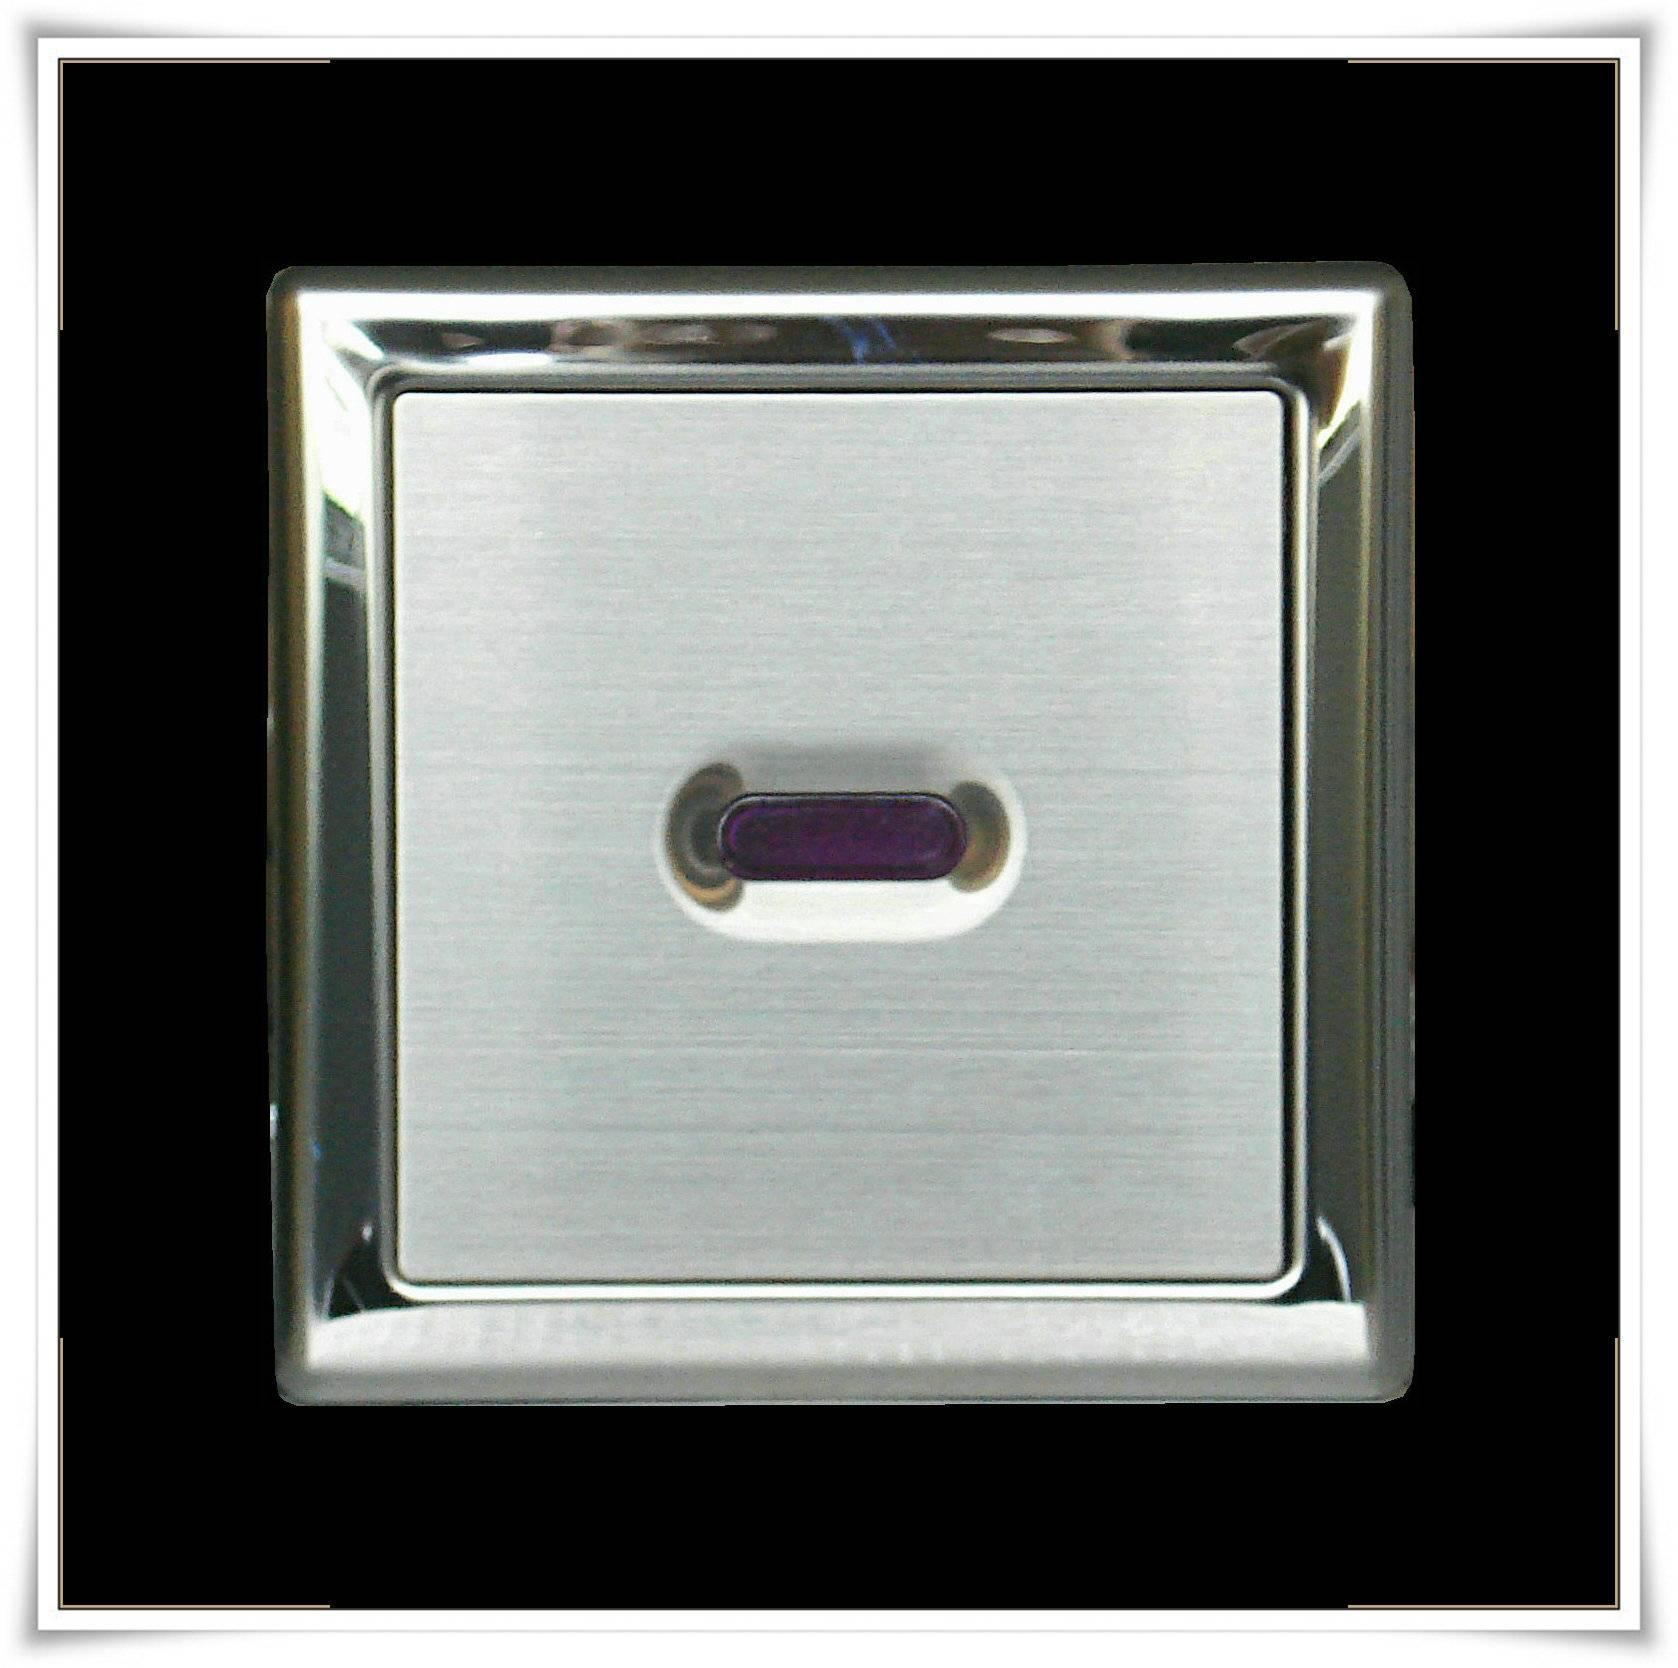 Self-powered auto urinal flush valve(XS-114)